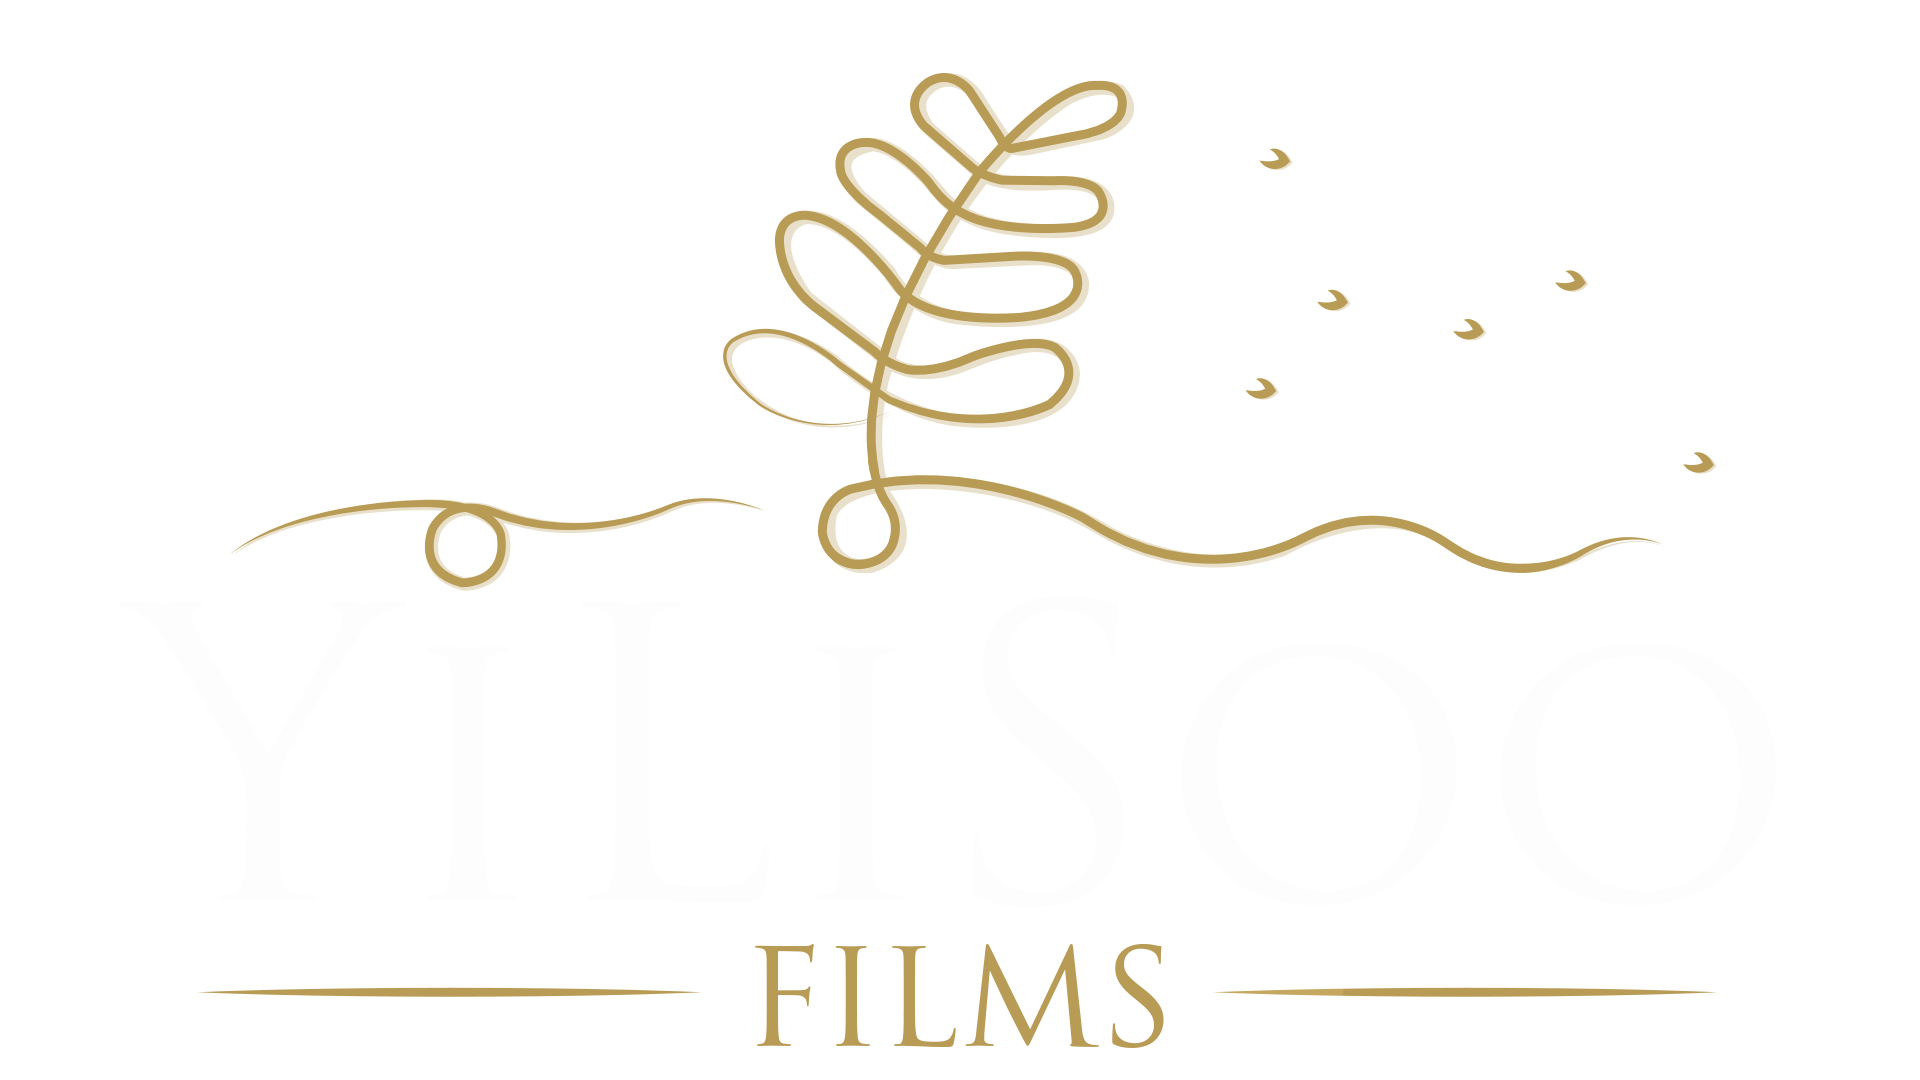 Yilisoo Films